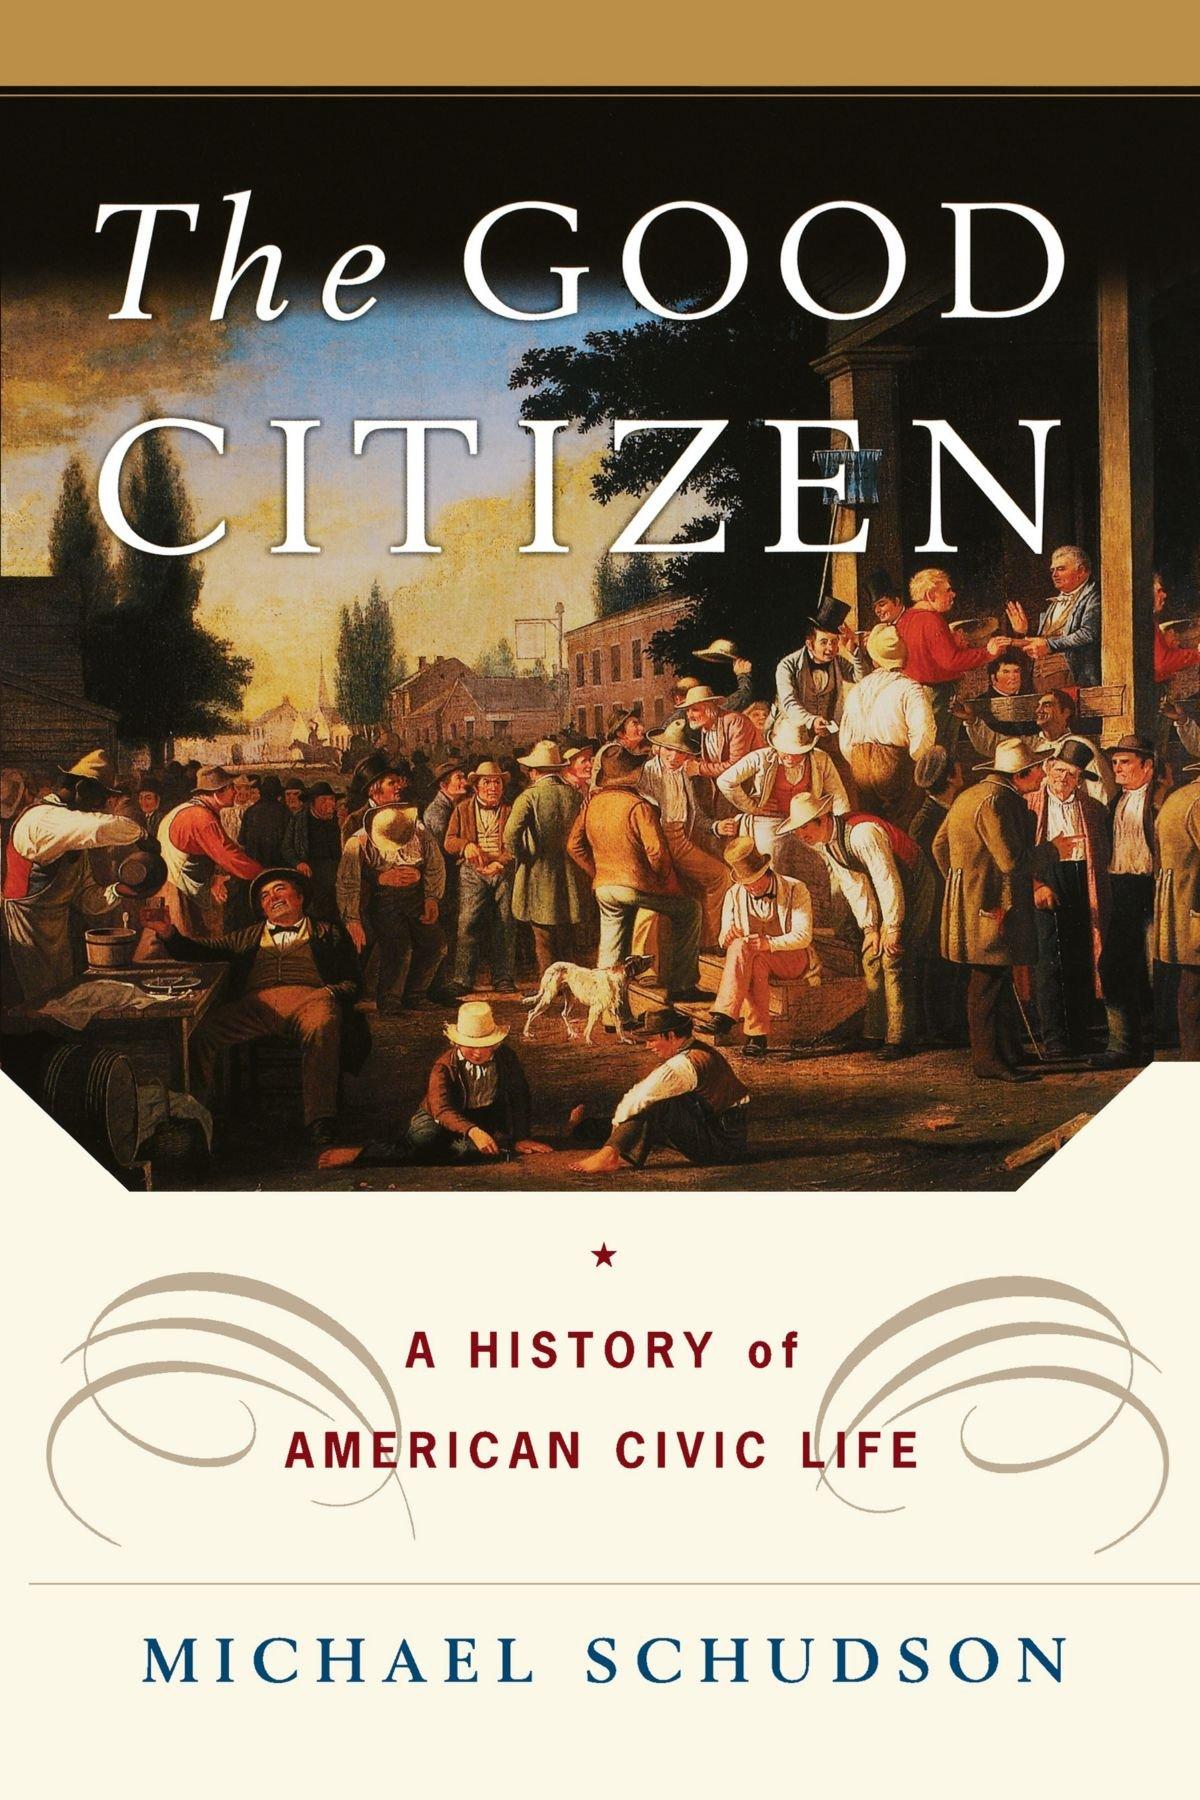 The Good Citizen: A History of American CIVIC Life: Michael Schudson:  9781451631623: Amazon.com: Books